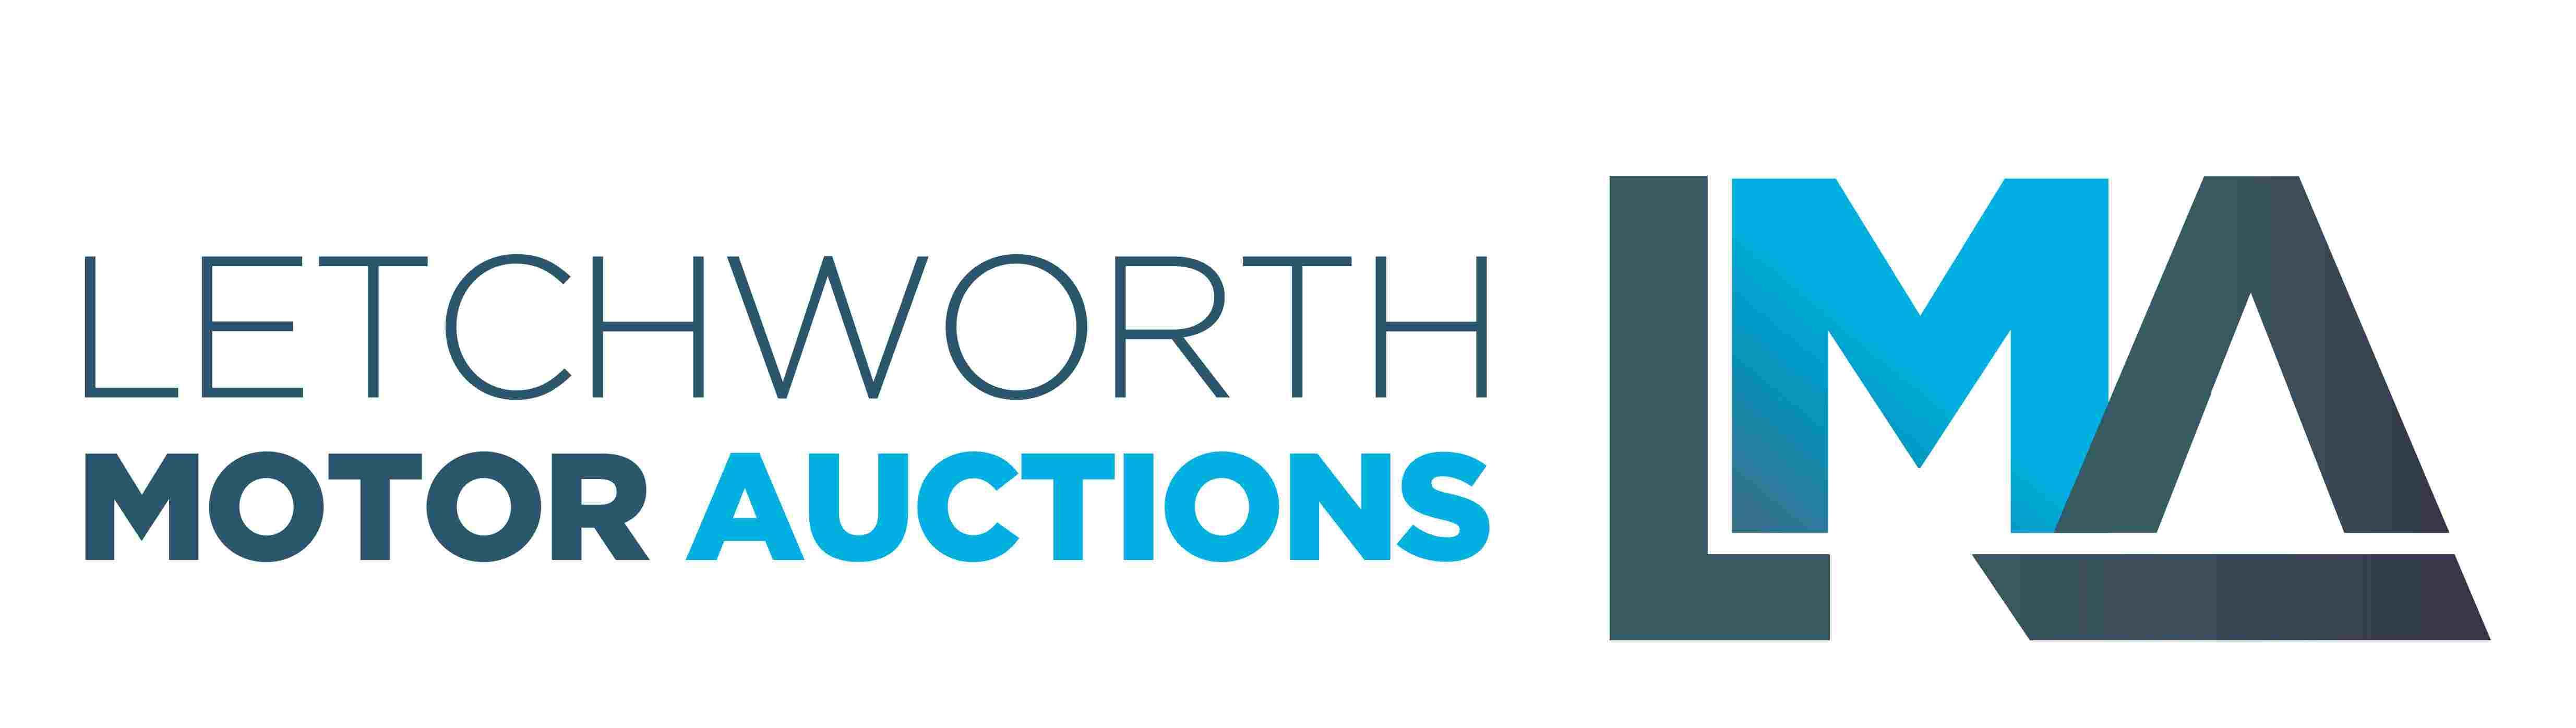 logo for Letchworth Motor Auctions Ltd